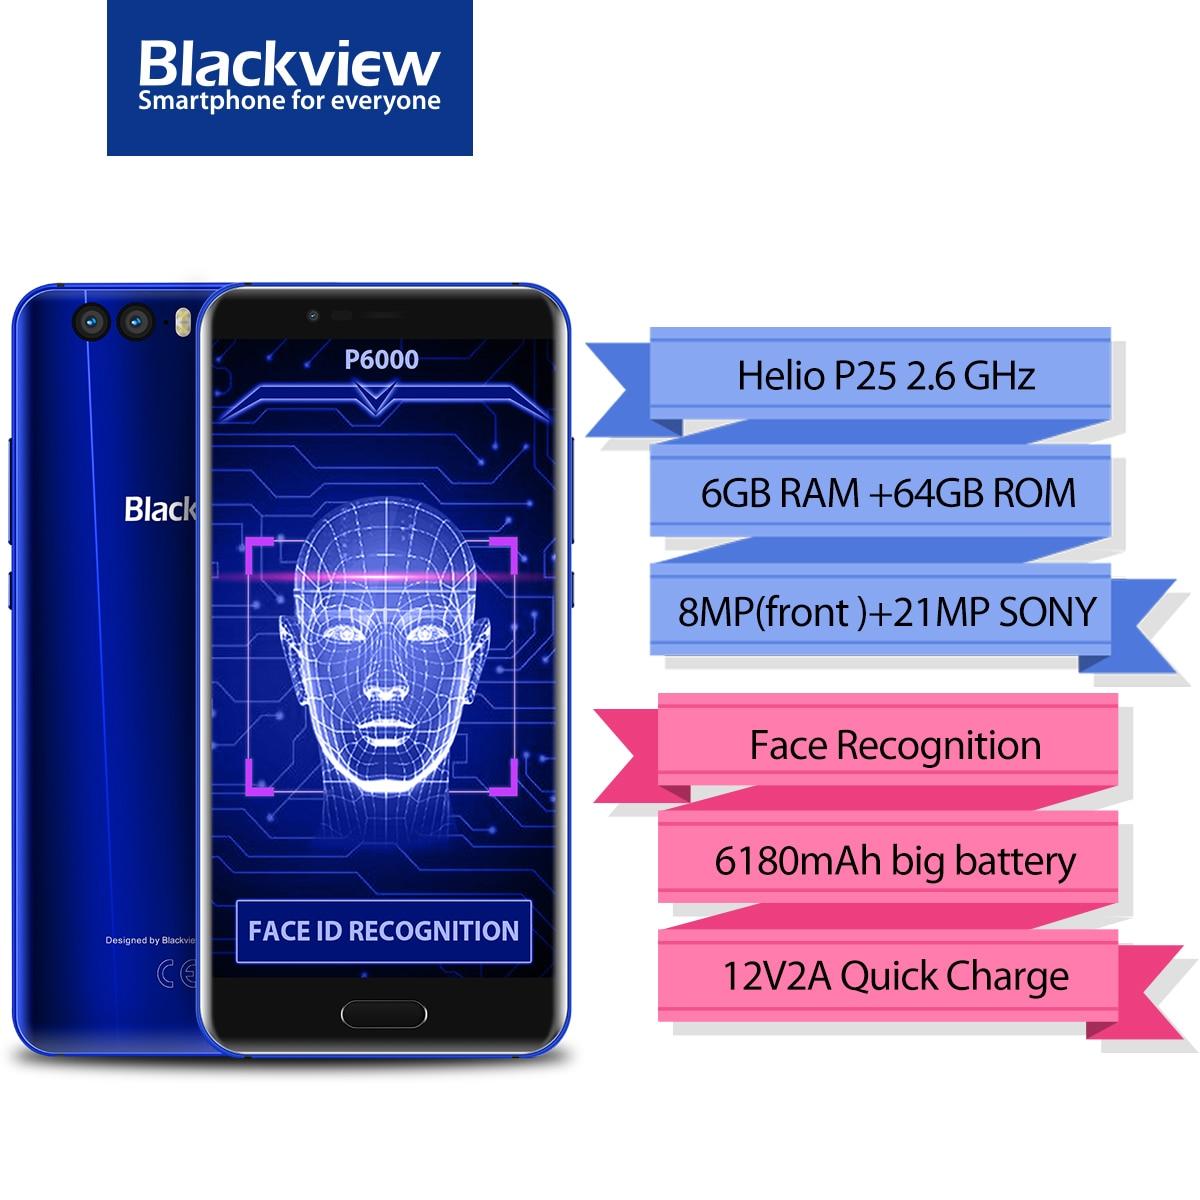 Blackview P6000 4g Phablet 6 gb di RAM 64 gb ROM 5.5 pollice Android 7.1 MTK6757CD OctaCore 21.0MP + 0.3MP macchina fotografica Viso Riconoscimento 6180 mah